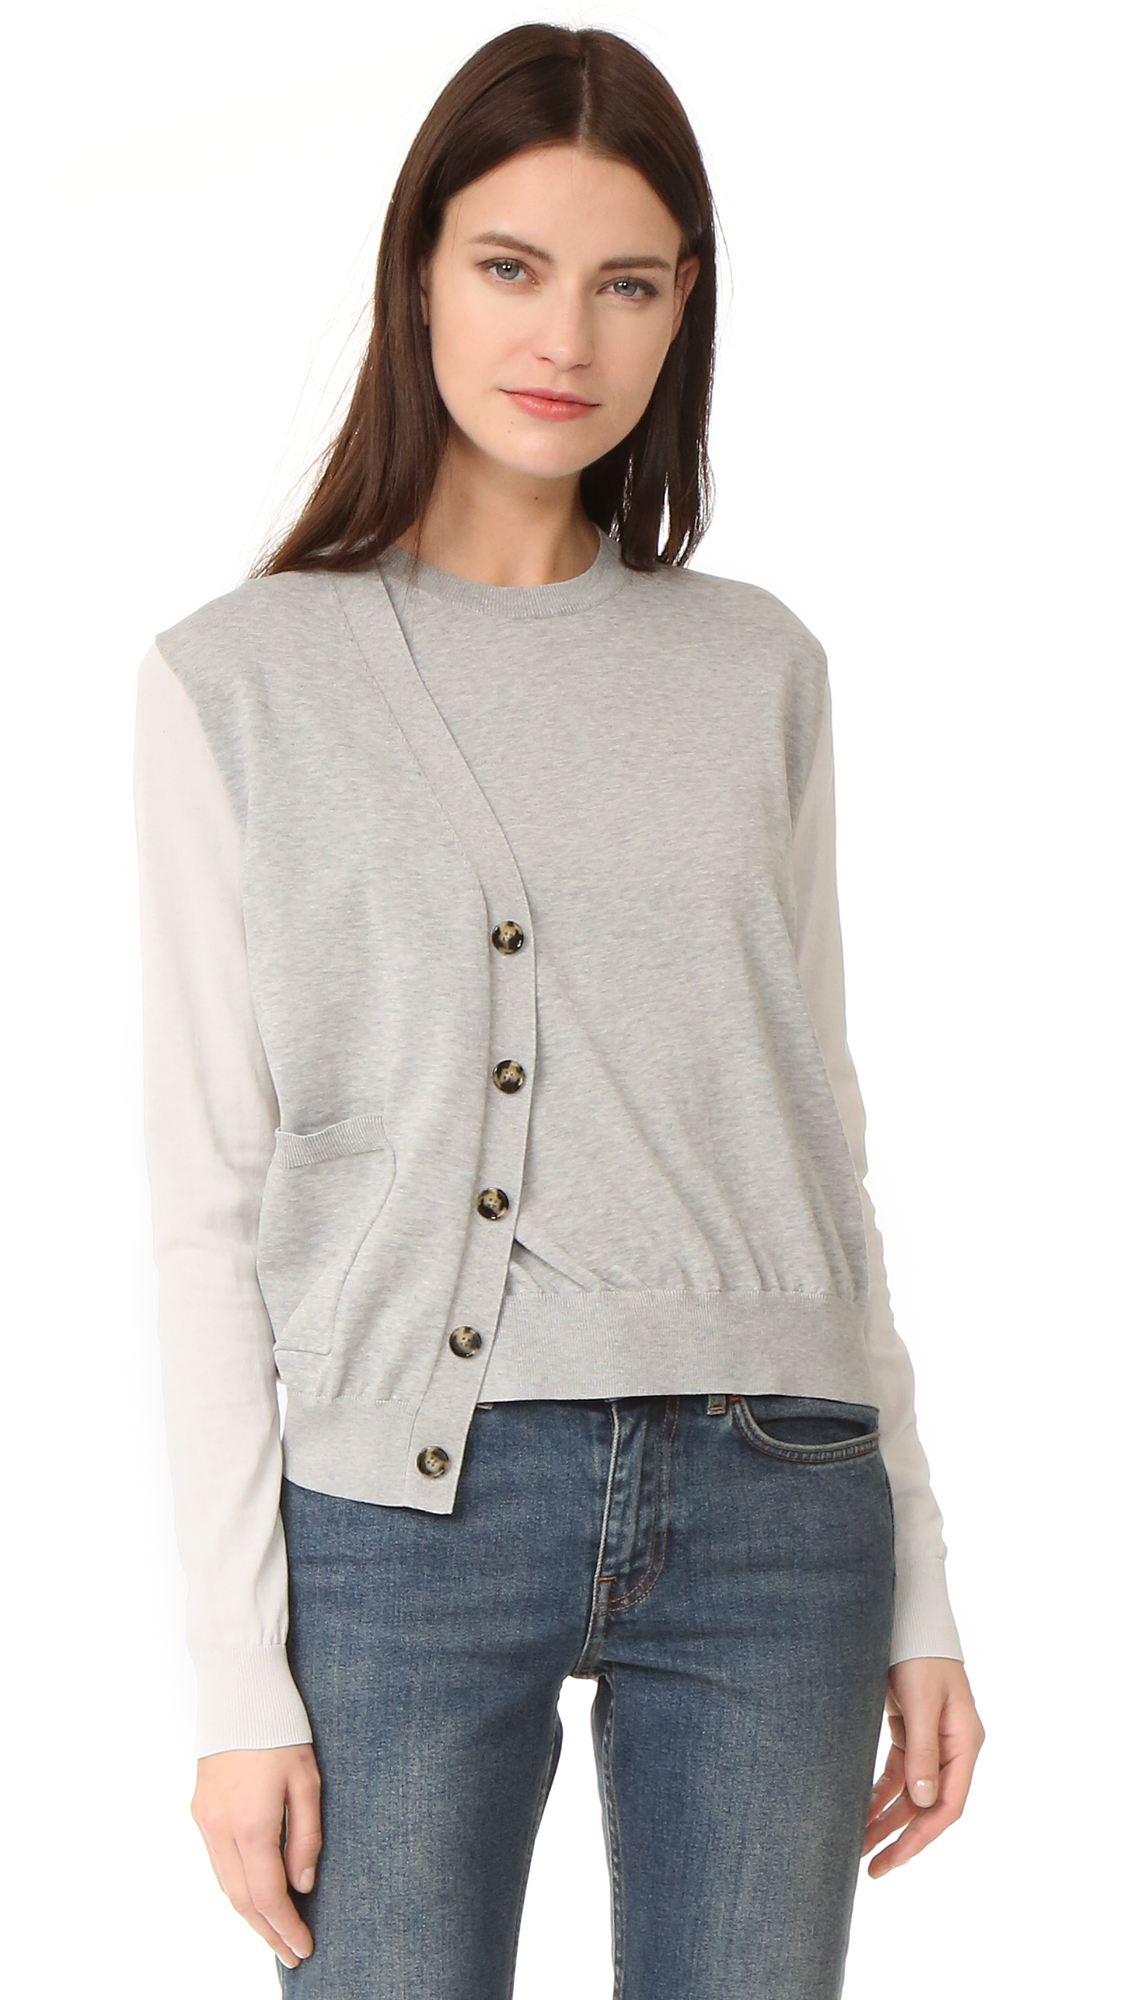 Acne Studios Kashi Sweater - Light Grey Melange at Shopbop